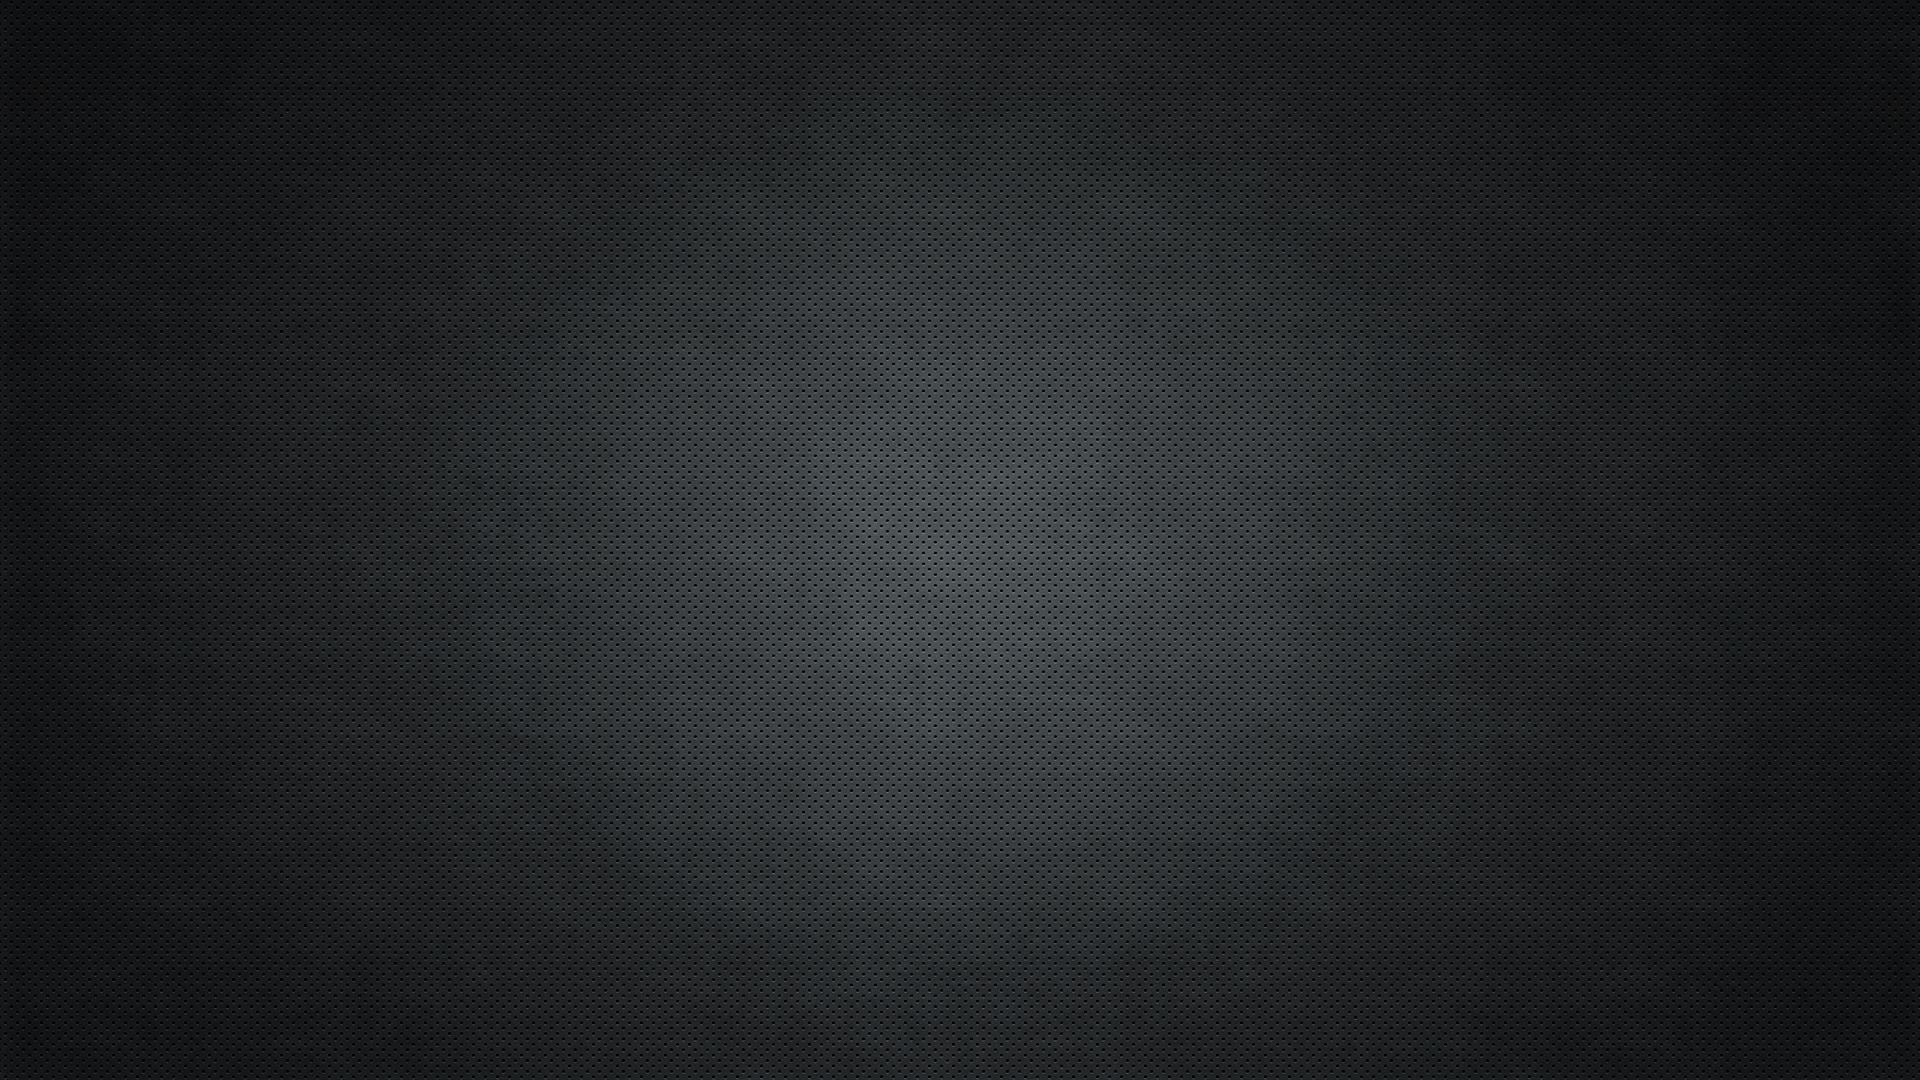 Dark Grey HD Wallpapers Backgrounds 1920x1080